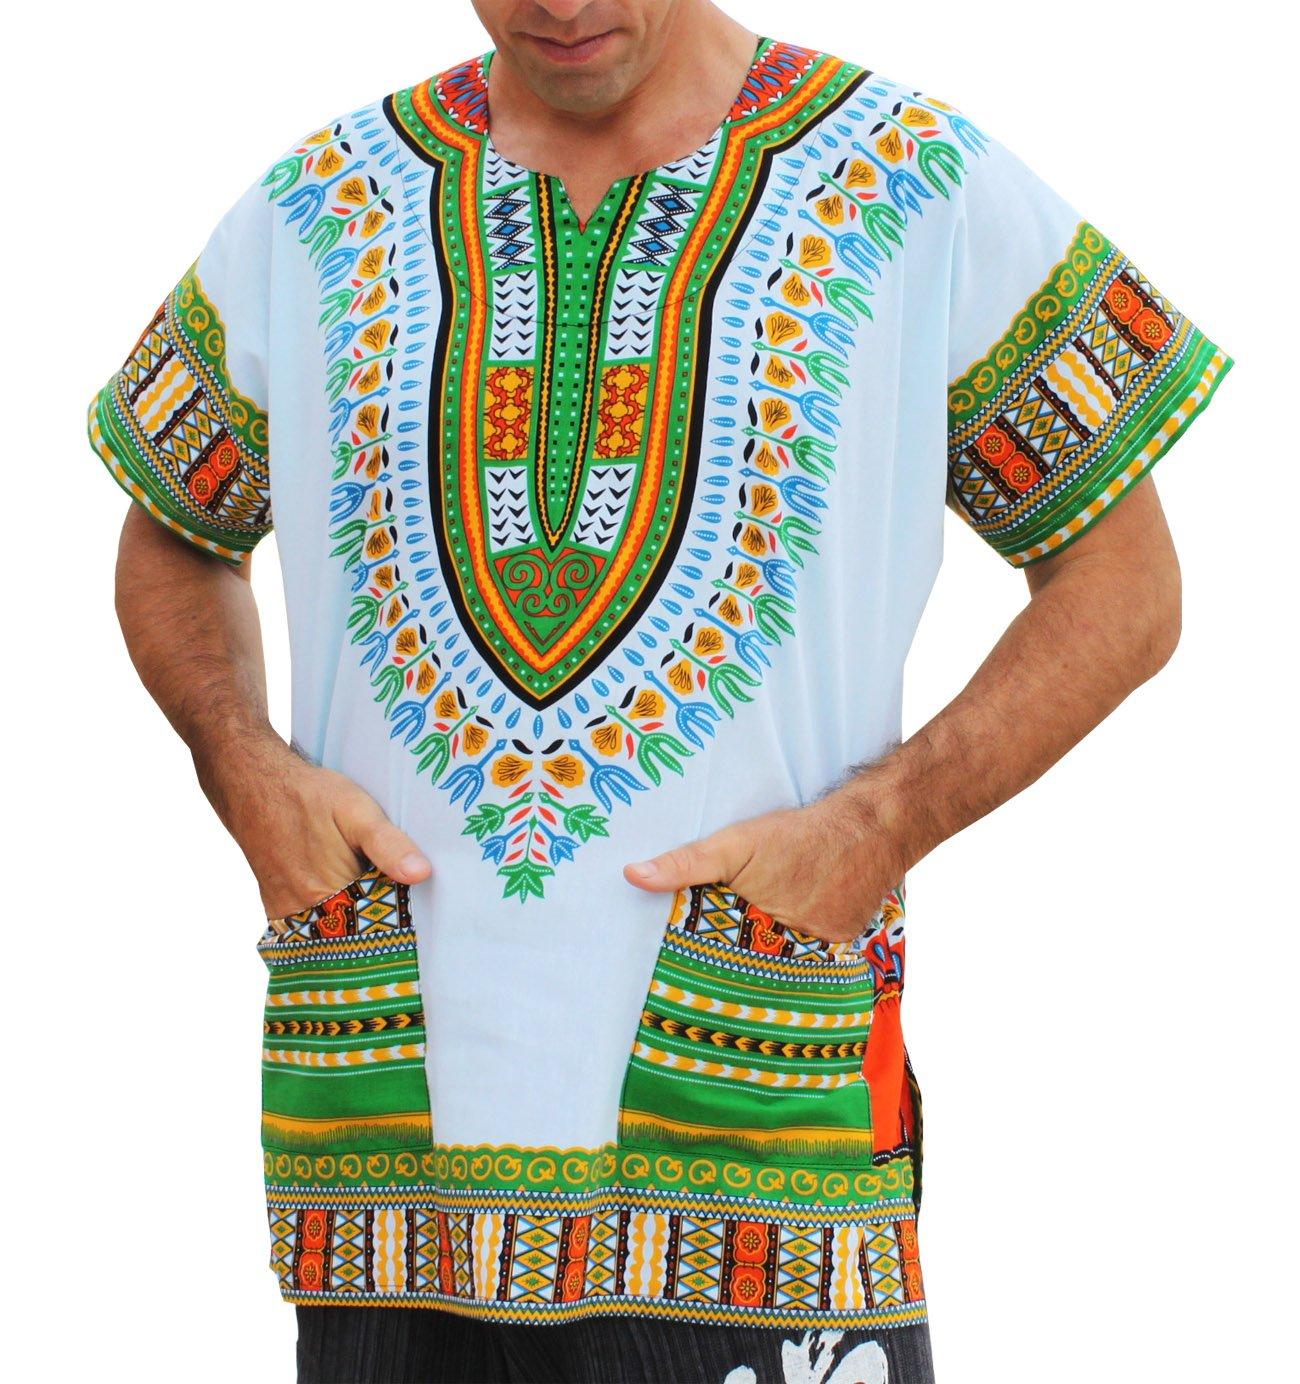 RaanPahMuang Brand Unisex Bright African White Dashiki Cotton Shirt #71 Light Green Medium